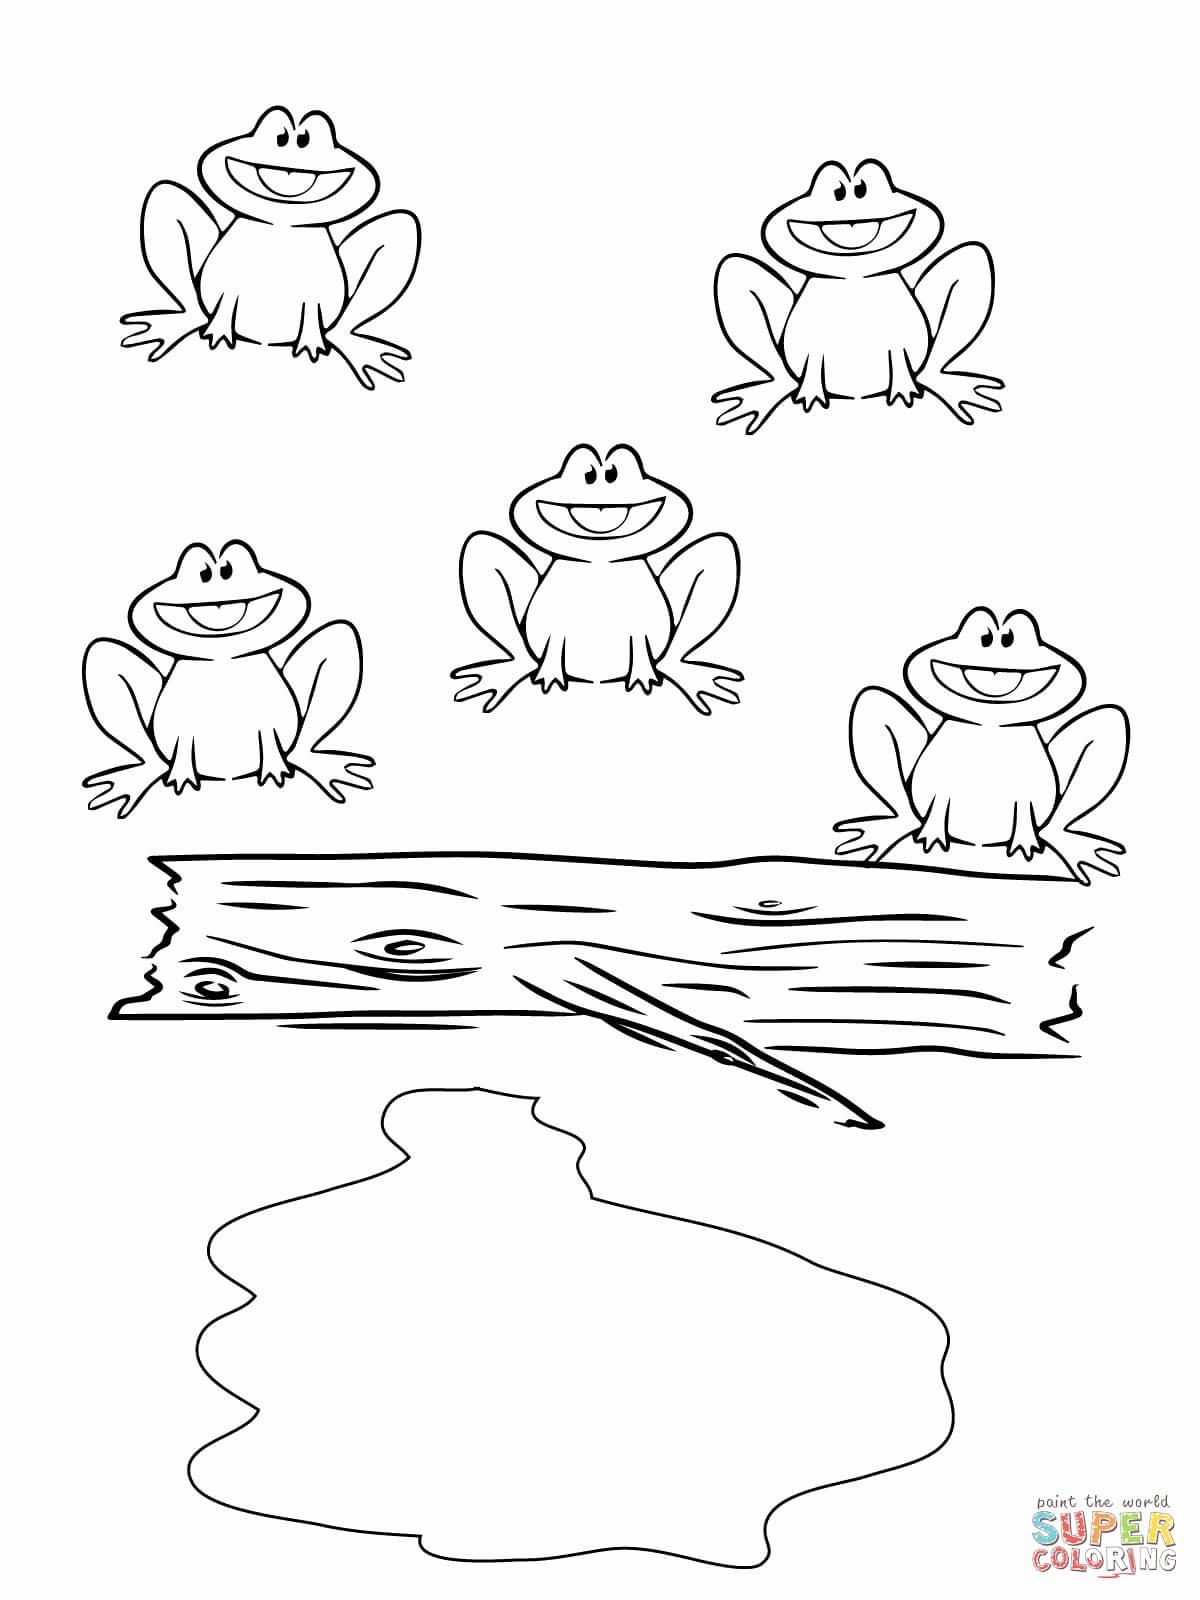 Frog Worksheets for Preschoolers Fresh Worksheets Worksheet Frog Coloring for Preschoolers